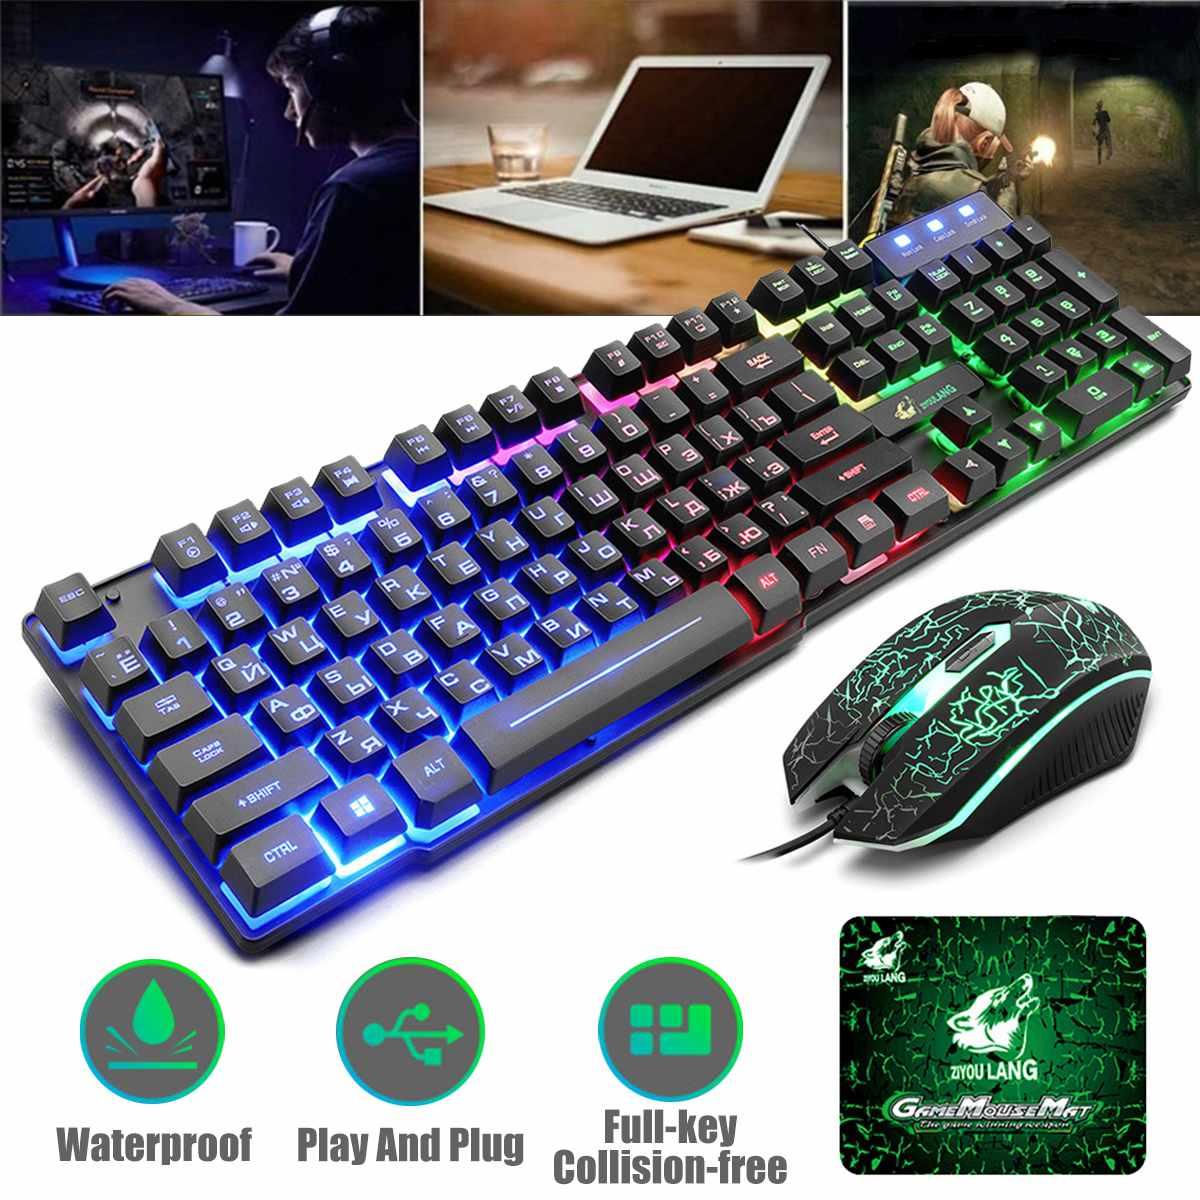 104 Keys Gaming English Russian Keyboard Mechanical Feel Rainbow LED Backlight USB Keyboard And Mouse Set Ergonomic For PC